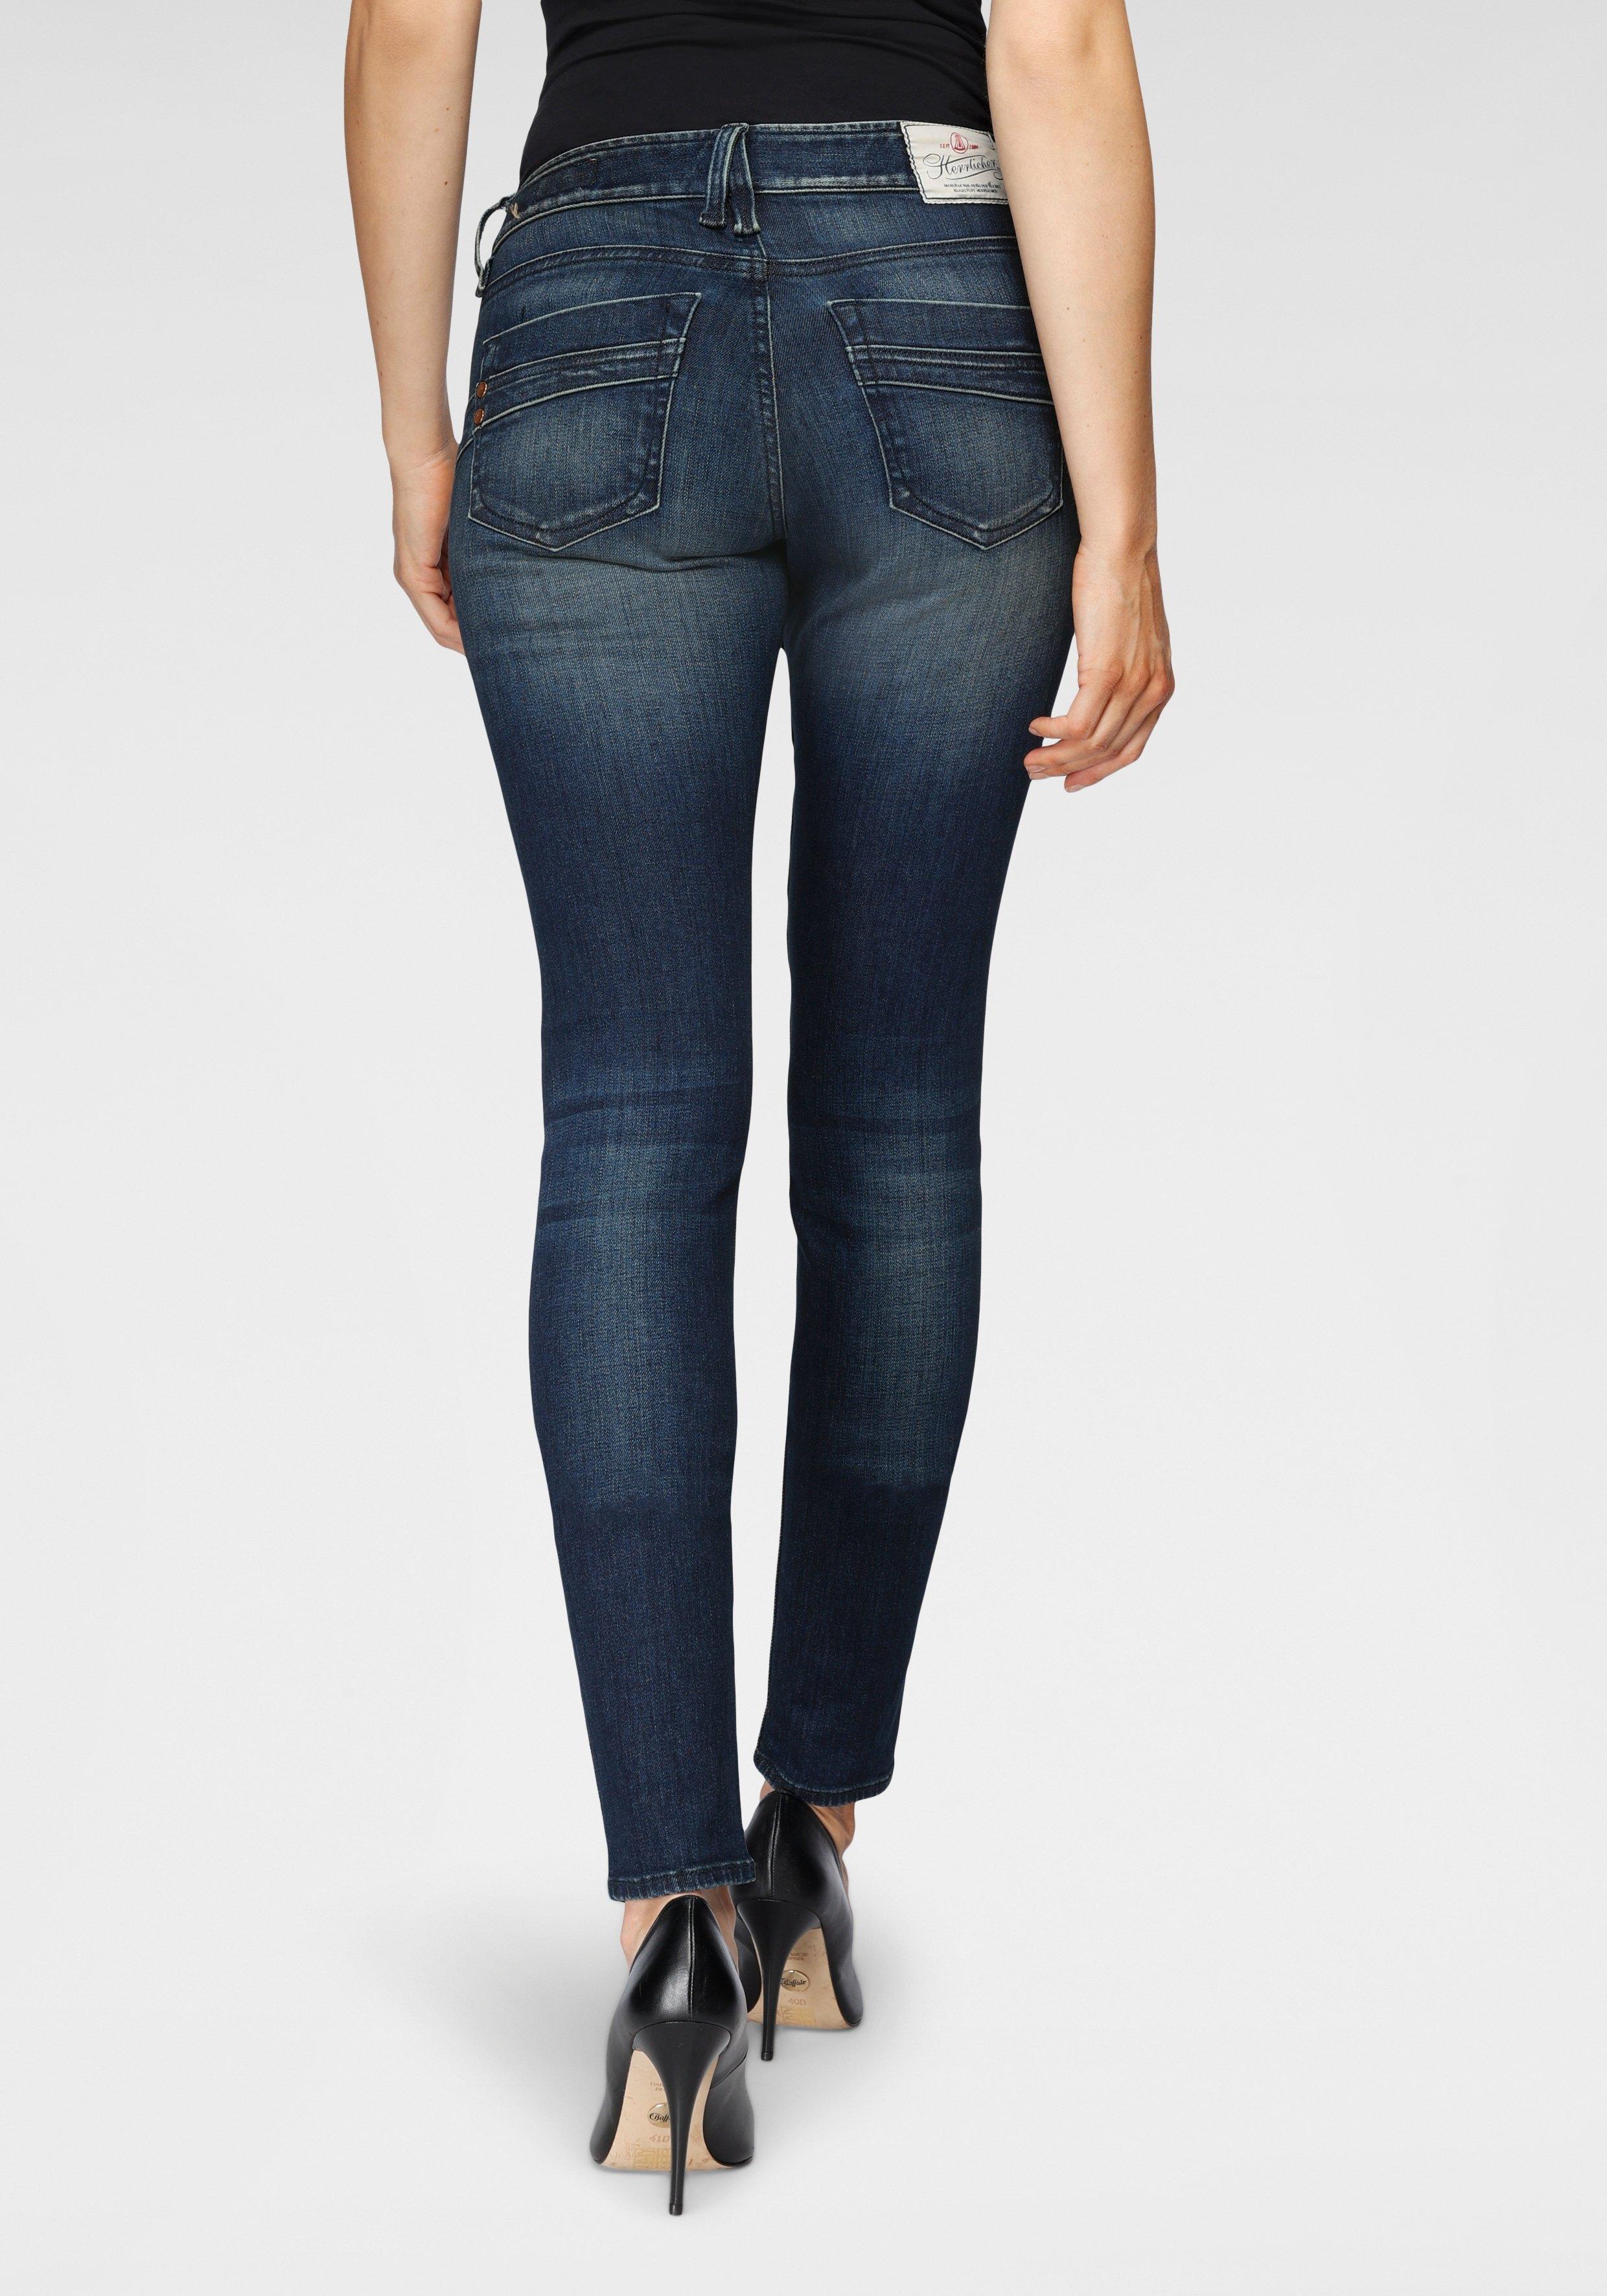 Herrlicher slim fit jeans TOUCH SLIM ORGANIC milieuvriendelijk dankzij kitotex technology nu online kopen bij OTTO